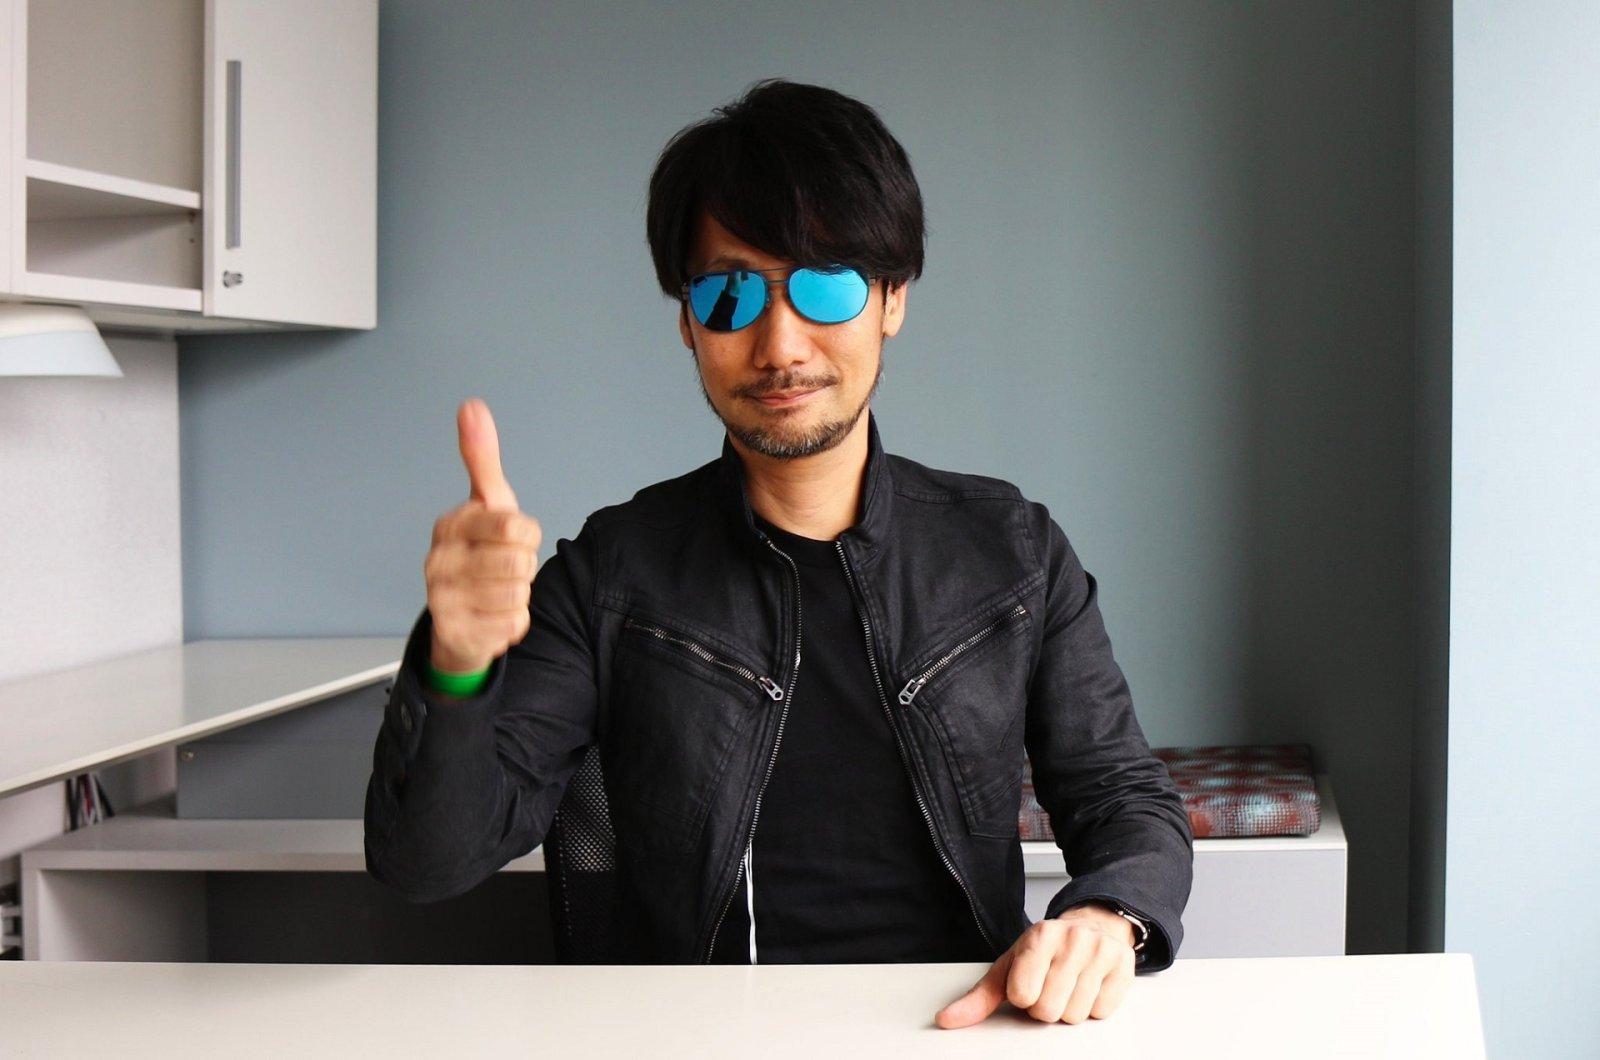 Kojima Productions官方宣布,将于5月30日公布《死亡搁浅》的最新情报